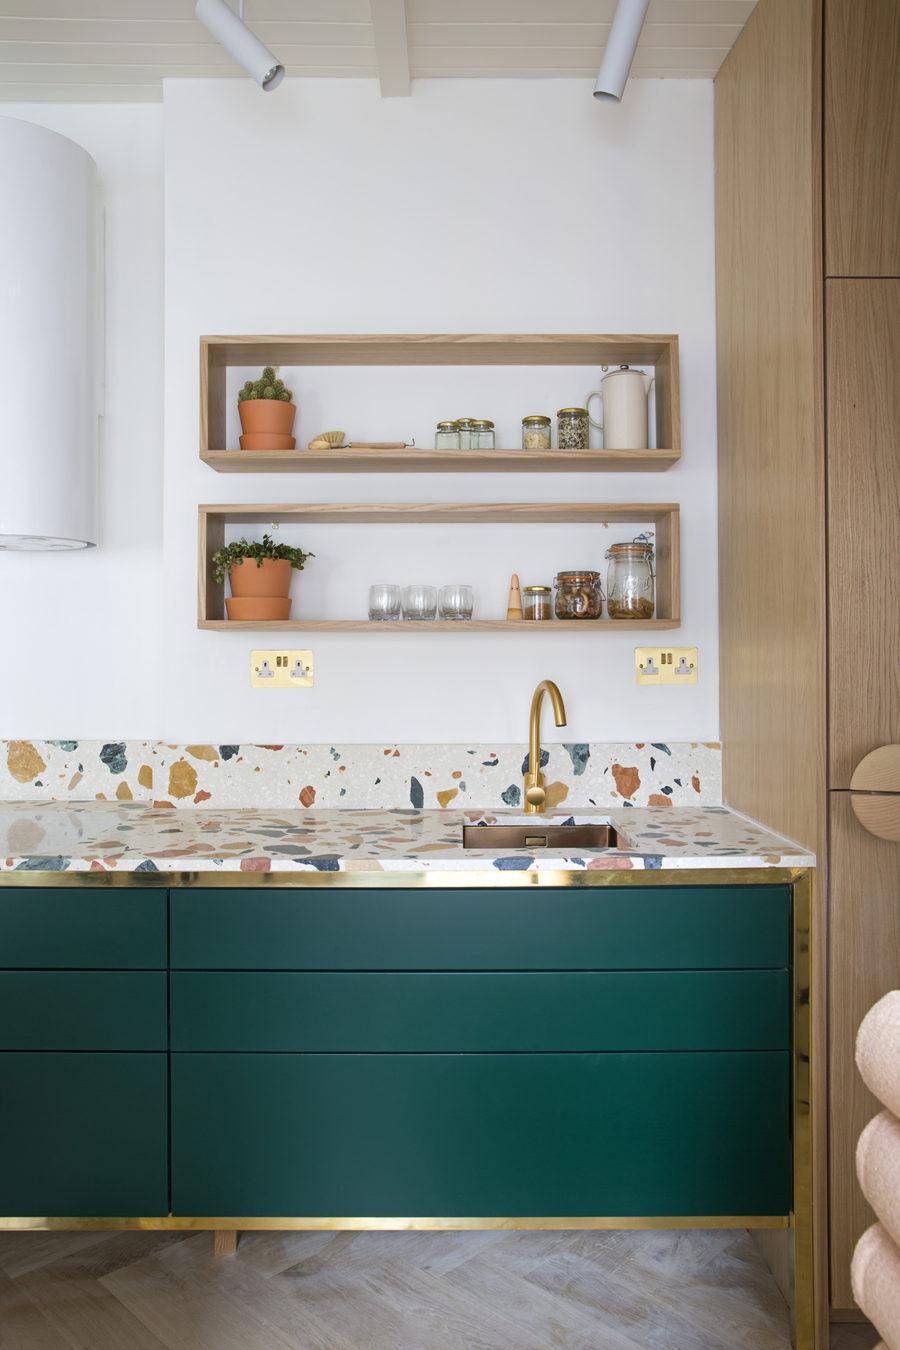 Kuhinjske radne ploče drugačije teksture i boje  MojStan.net